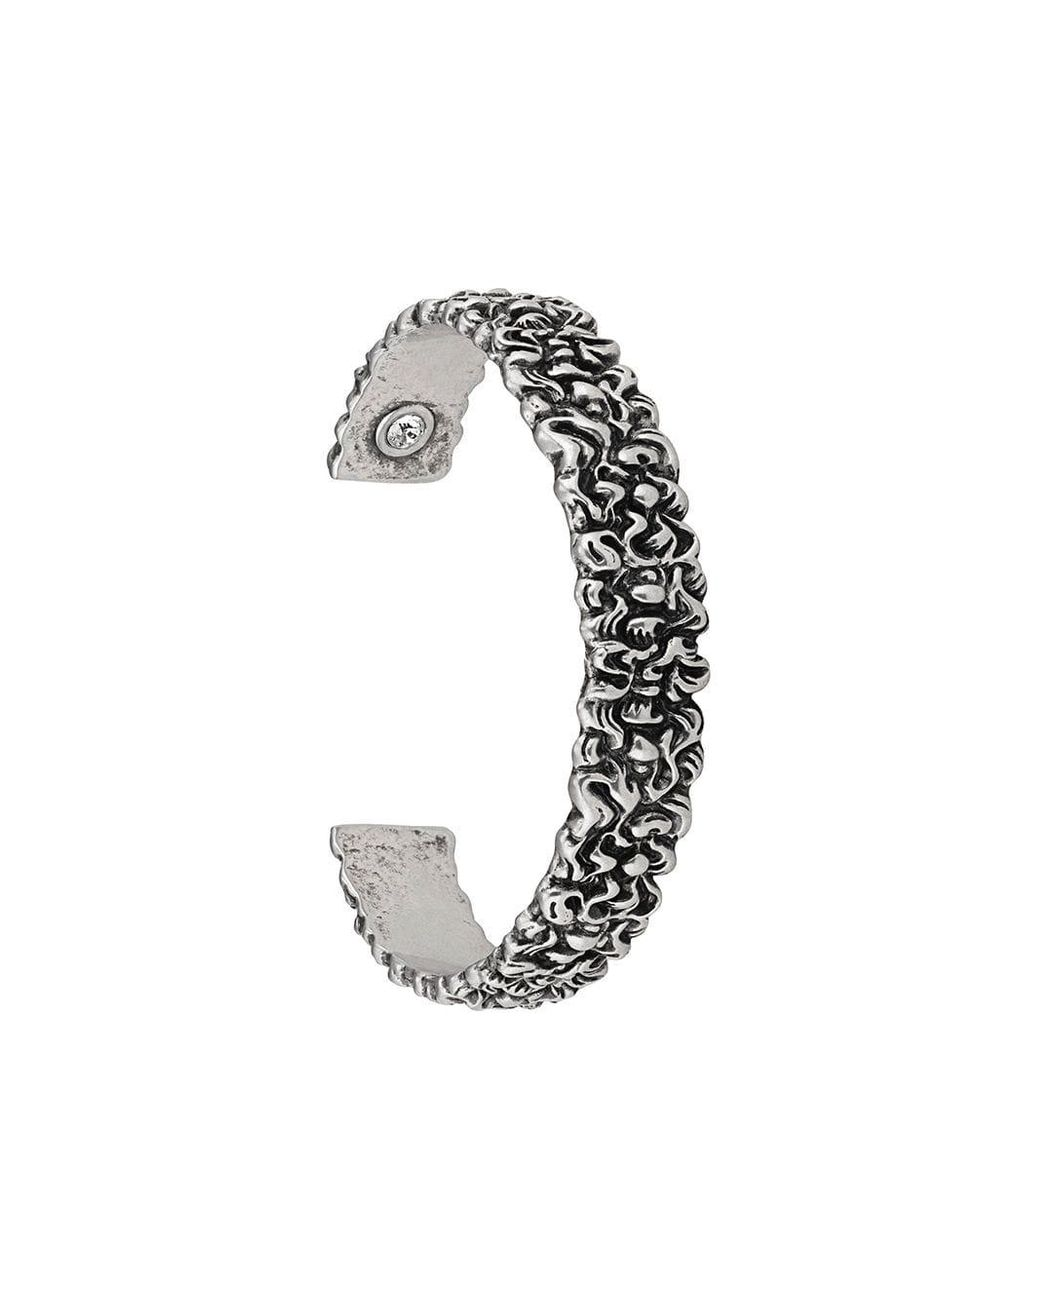 65bab0954a0 Men's Metallic Lion Mane Cuff Bracelet With Crystal